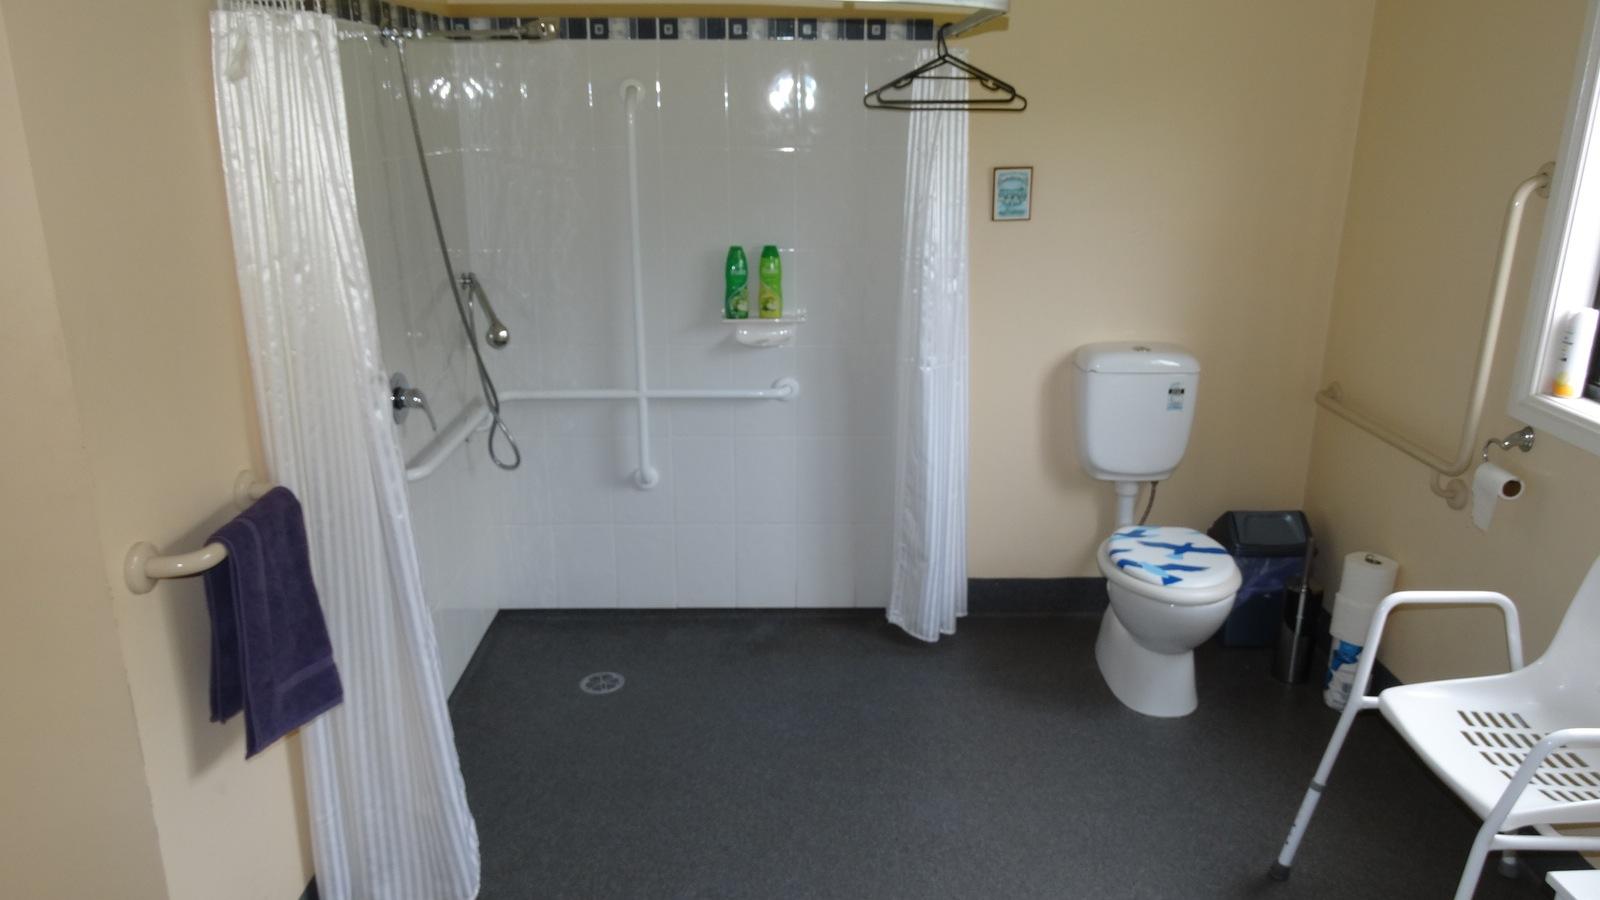 Fully accessible bathroom